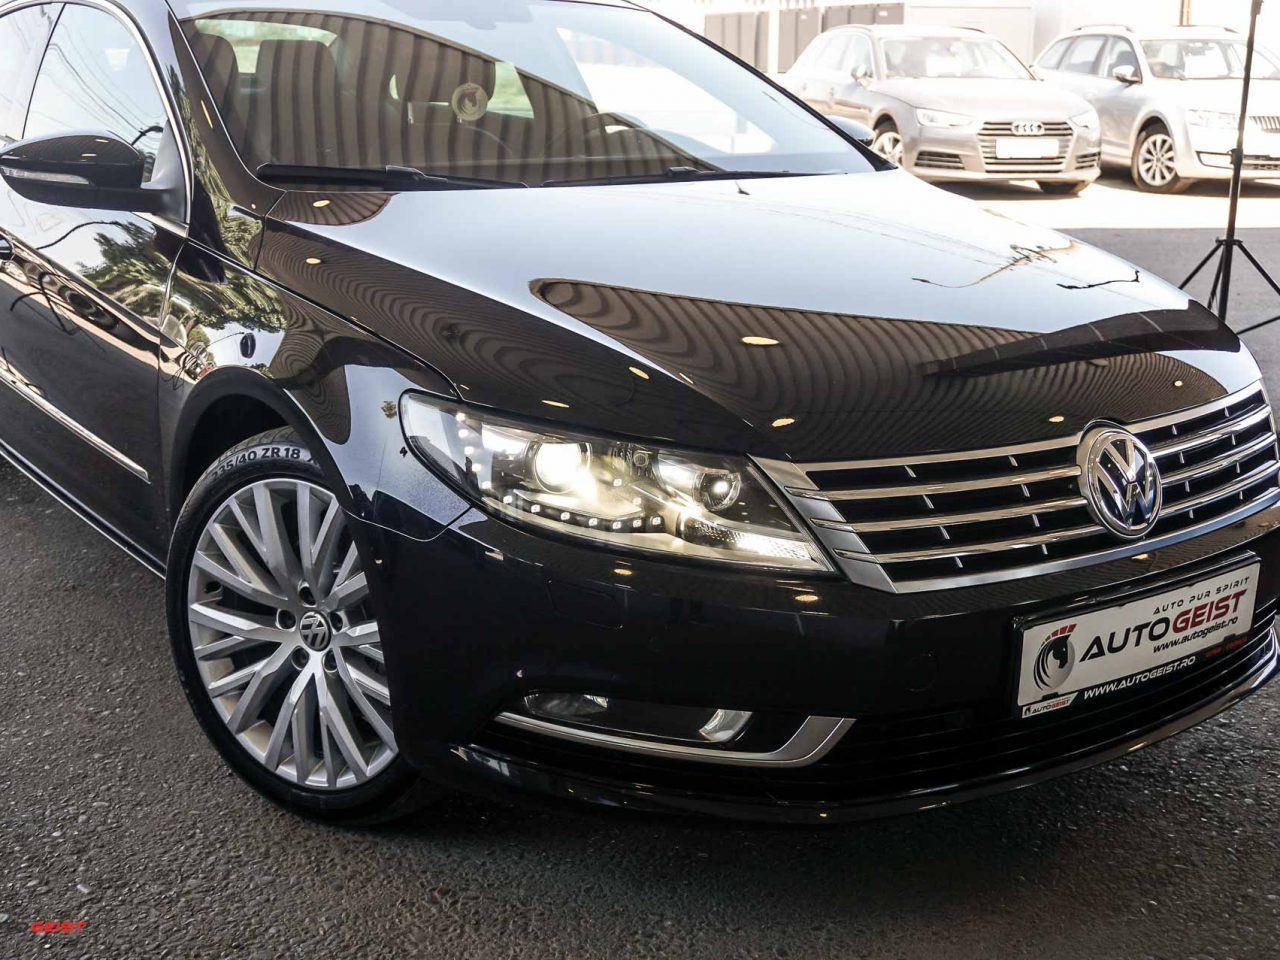 volkswagen-cc-negru-at-02992